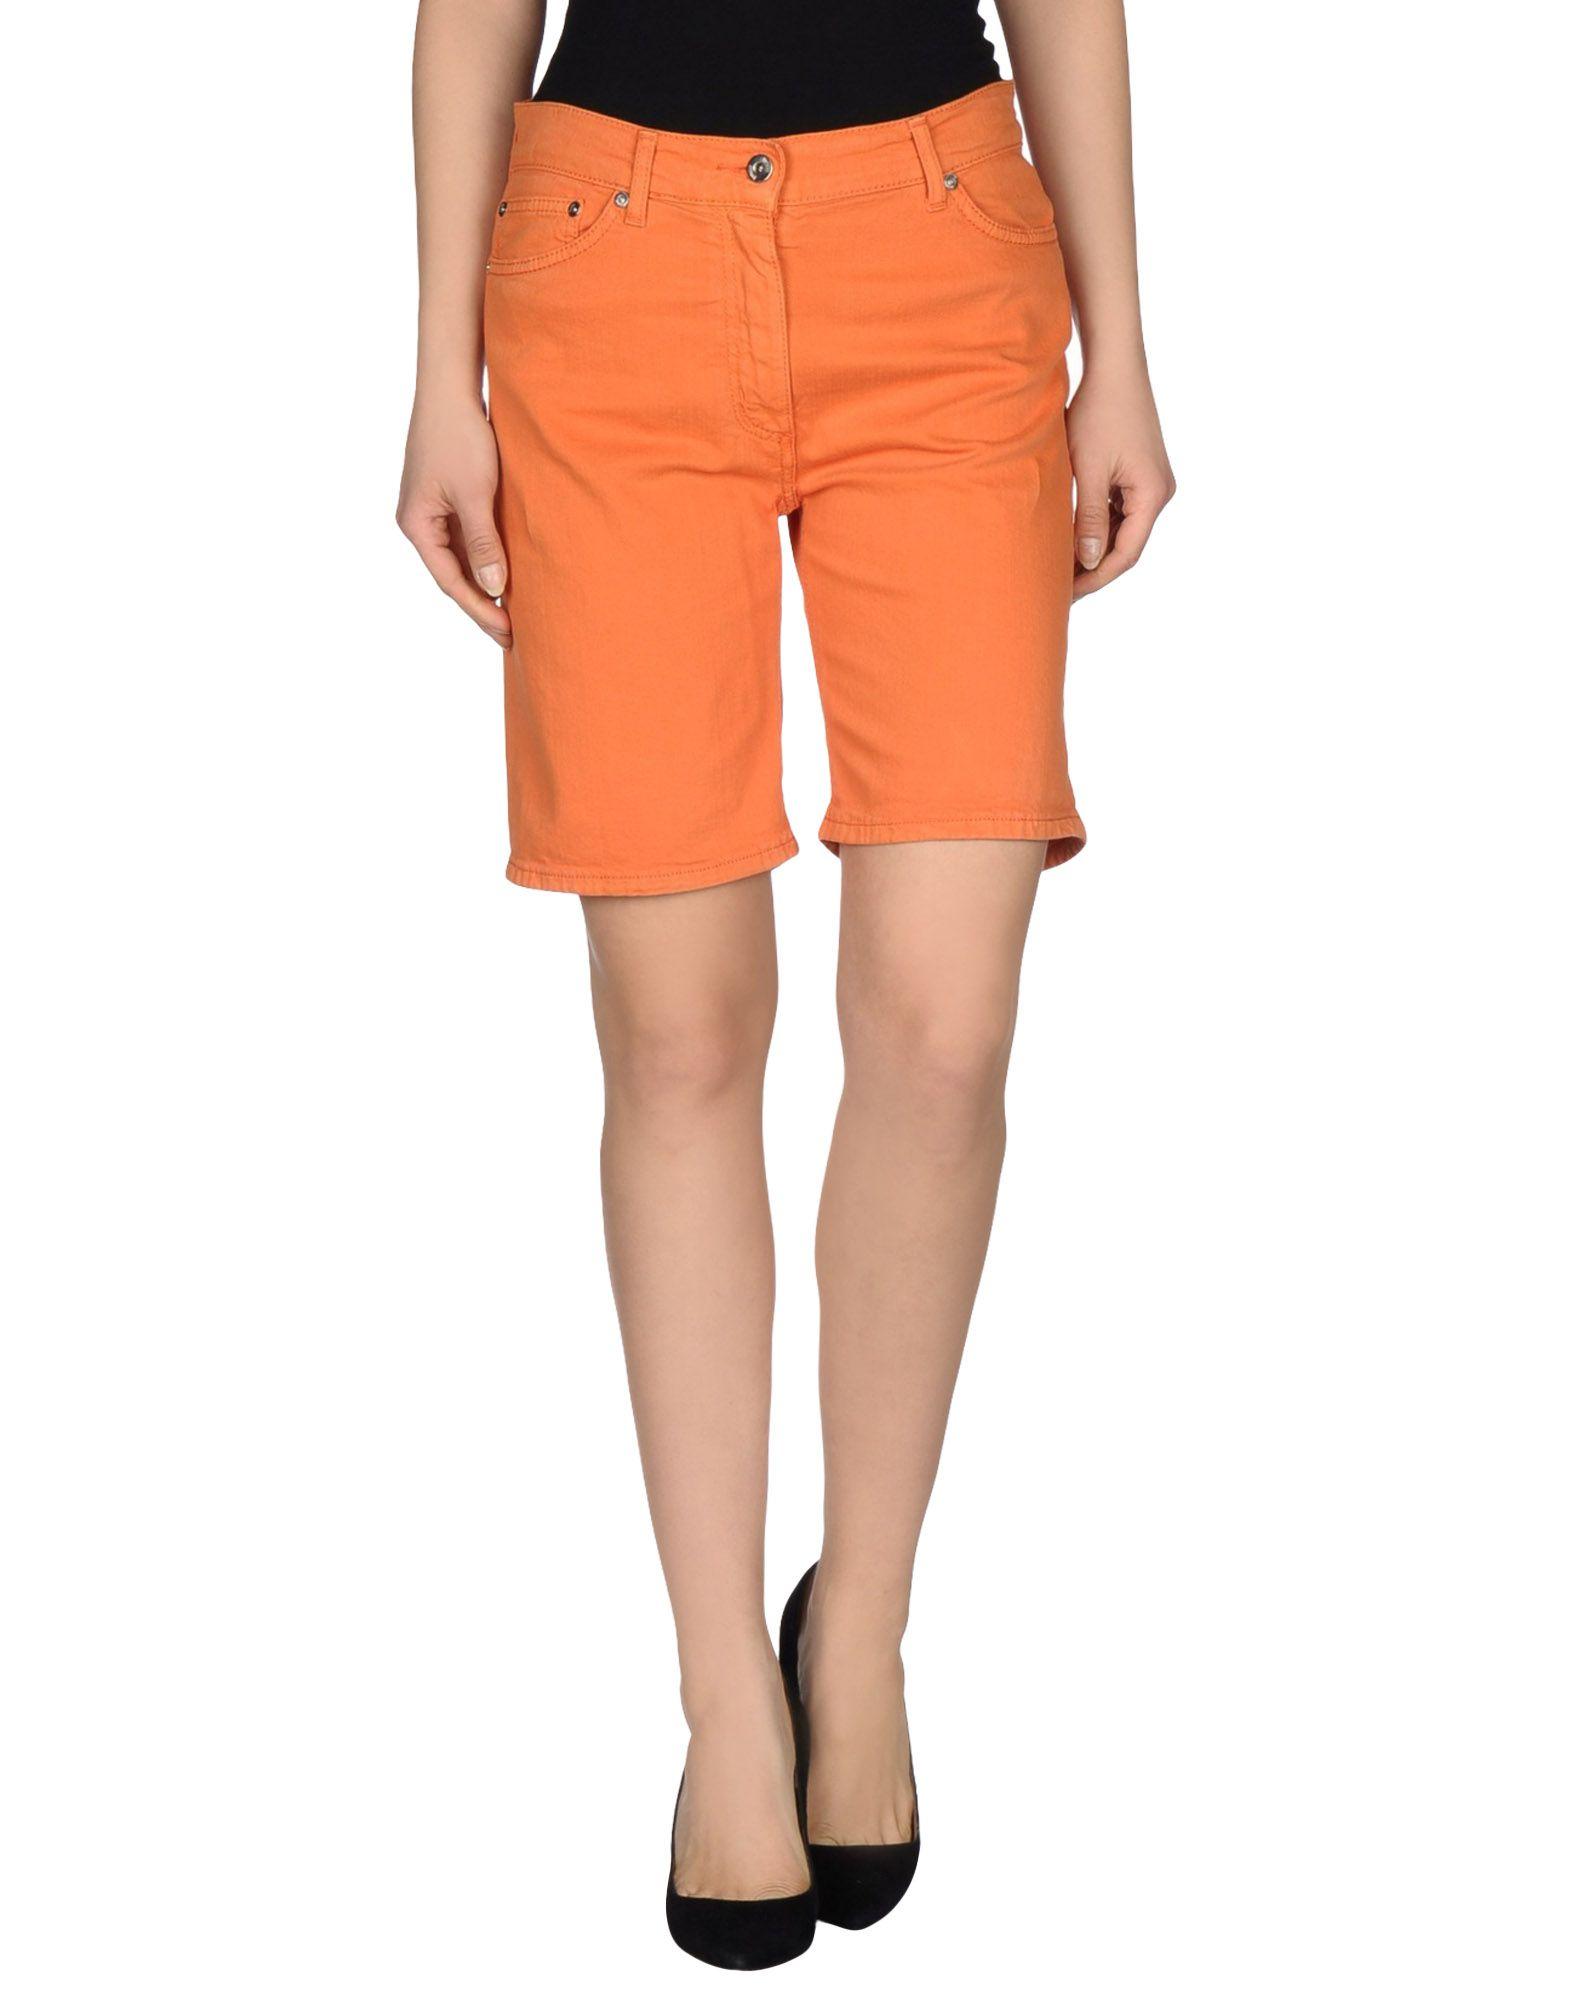 dondup denim bermudas in orange lyst. Black Bedroom Furniture Sets. Home Design Ideas